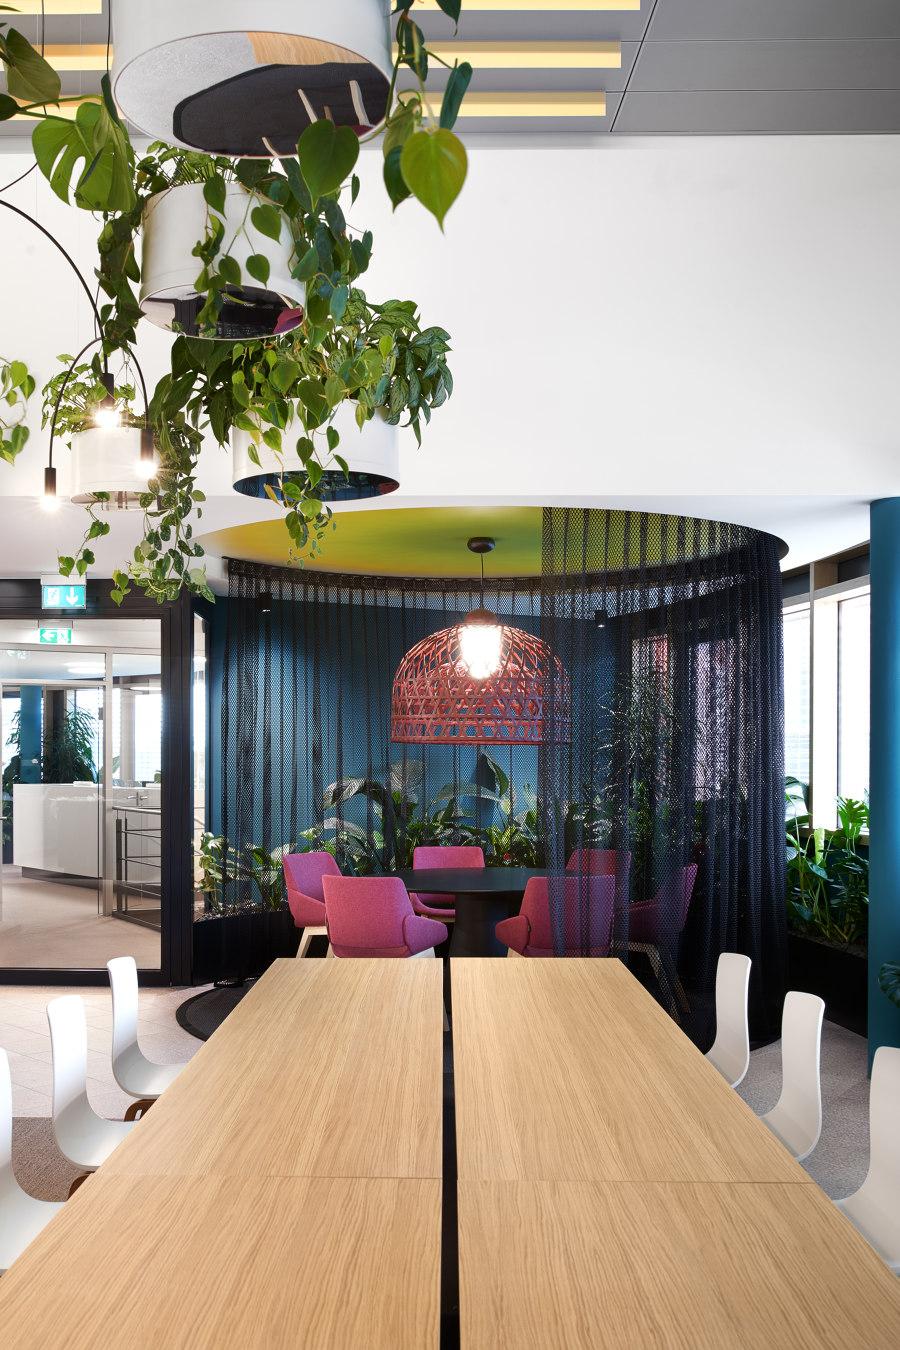 Roman Klis – Malediven des Designs di Apartment 91 |